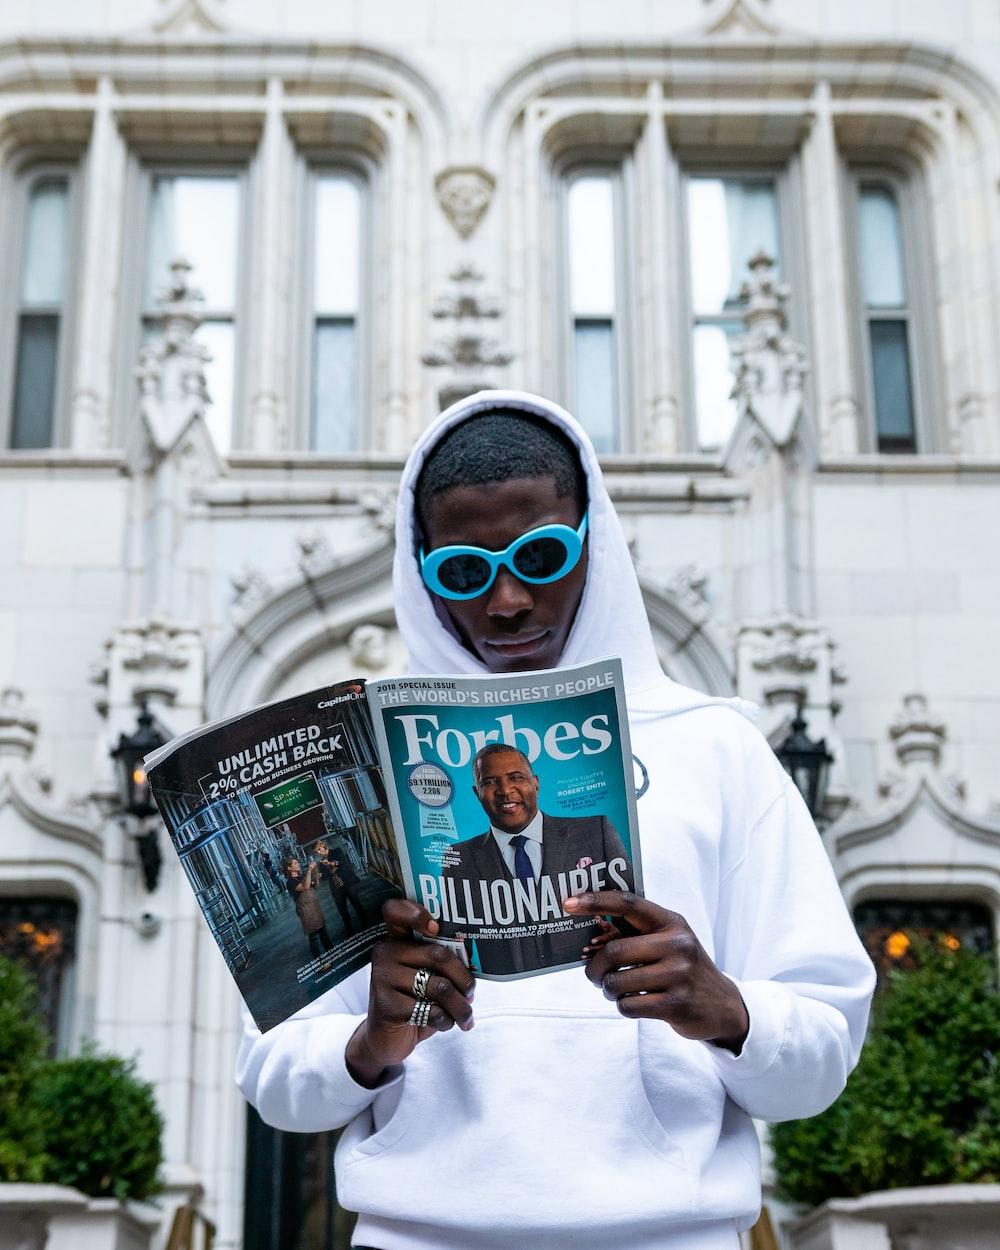 man in white thobe holding newspaper